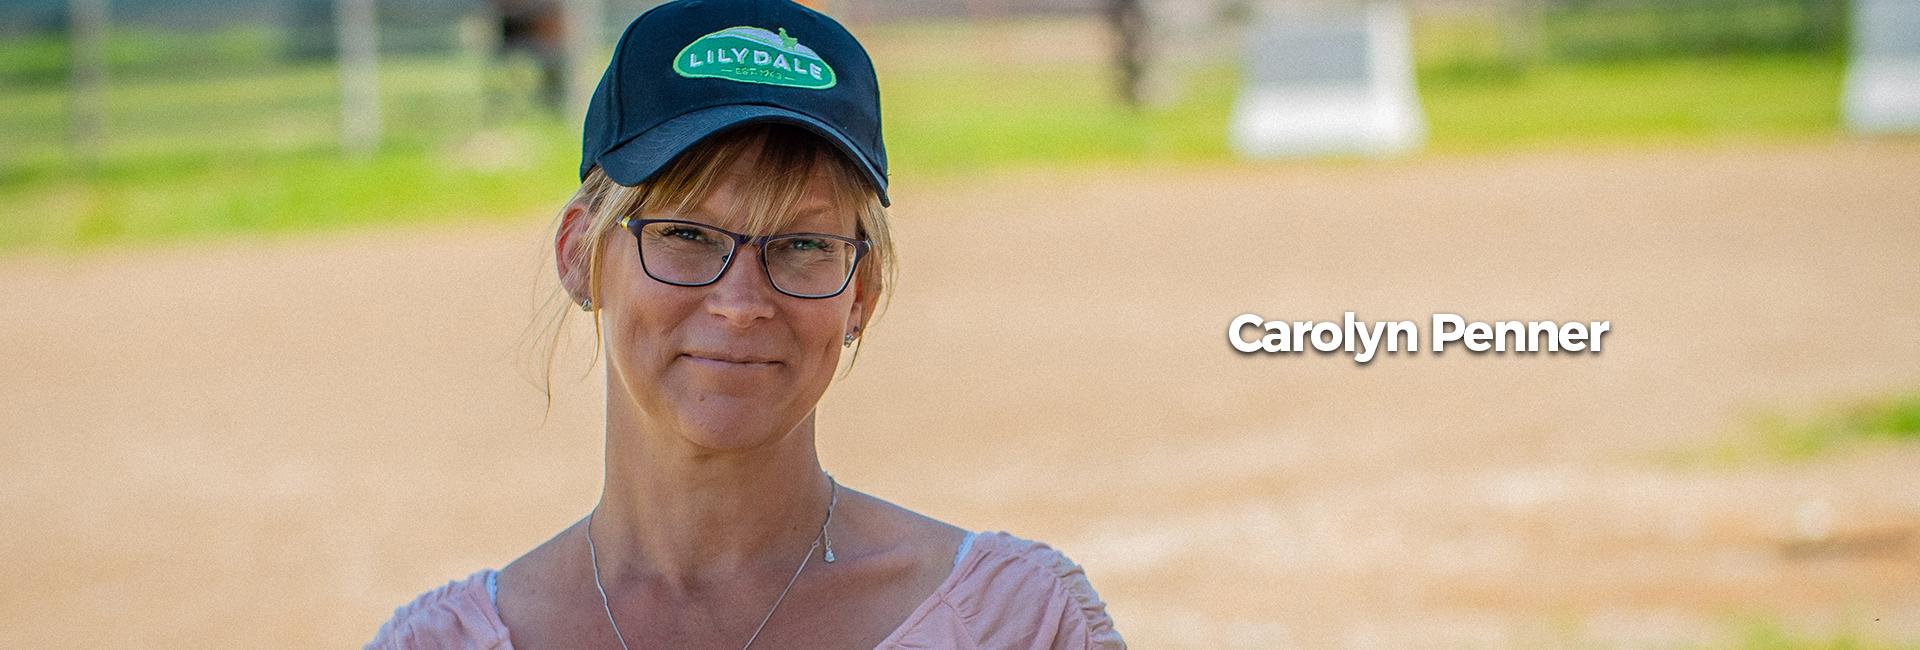 Carolyn Penner